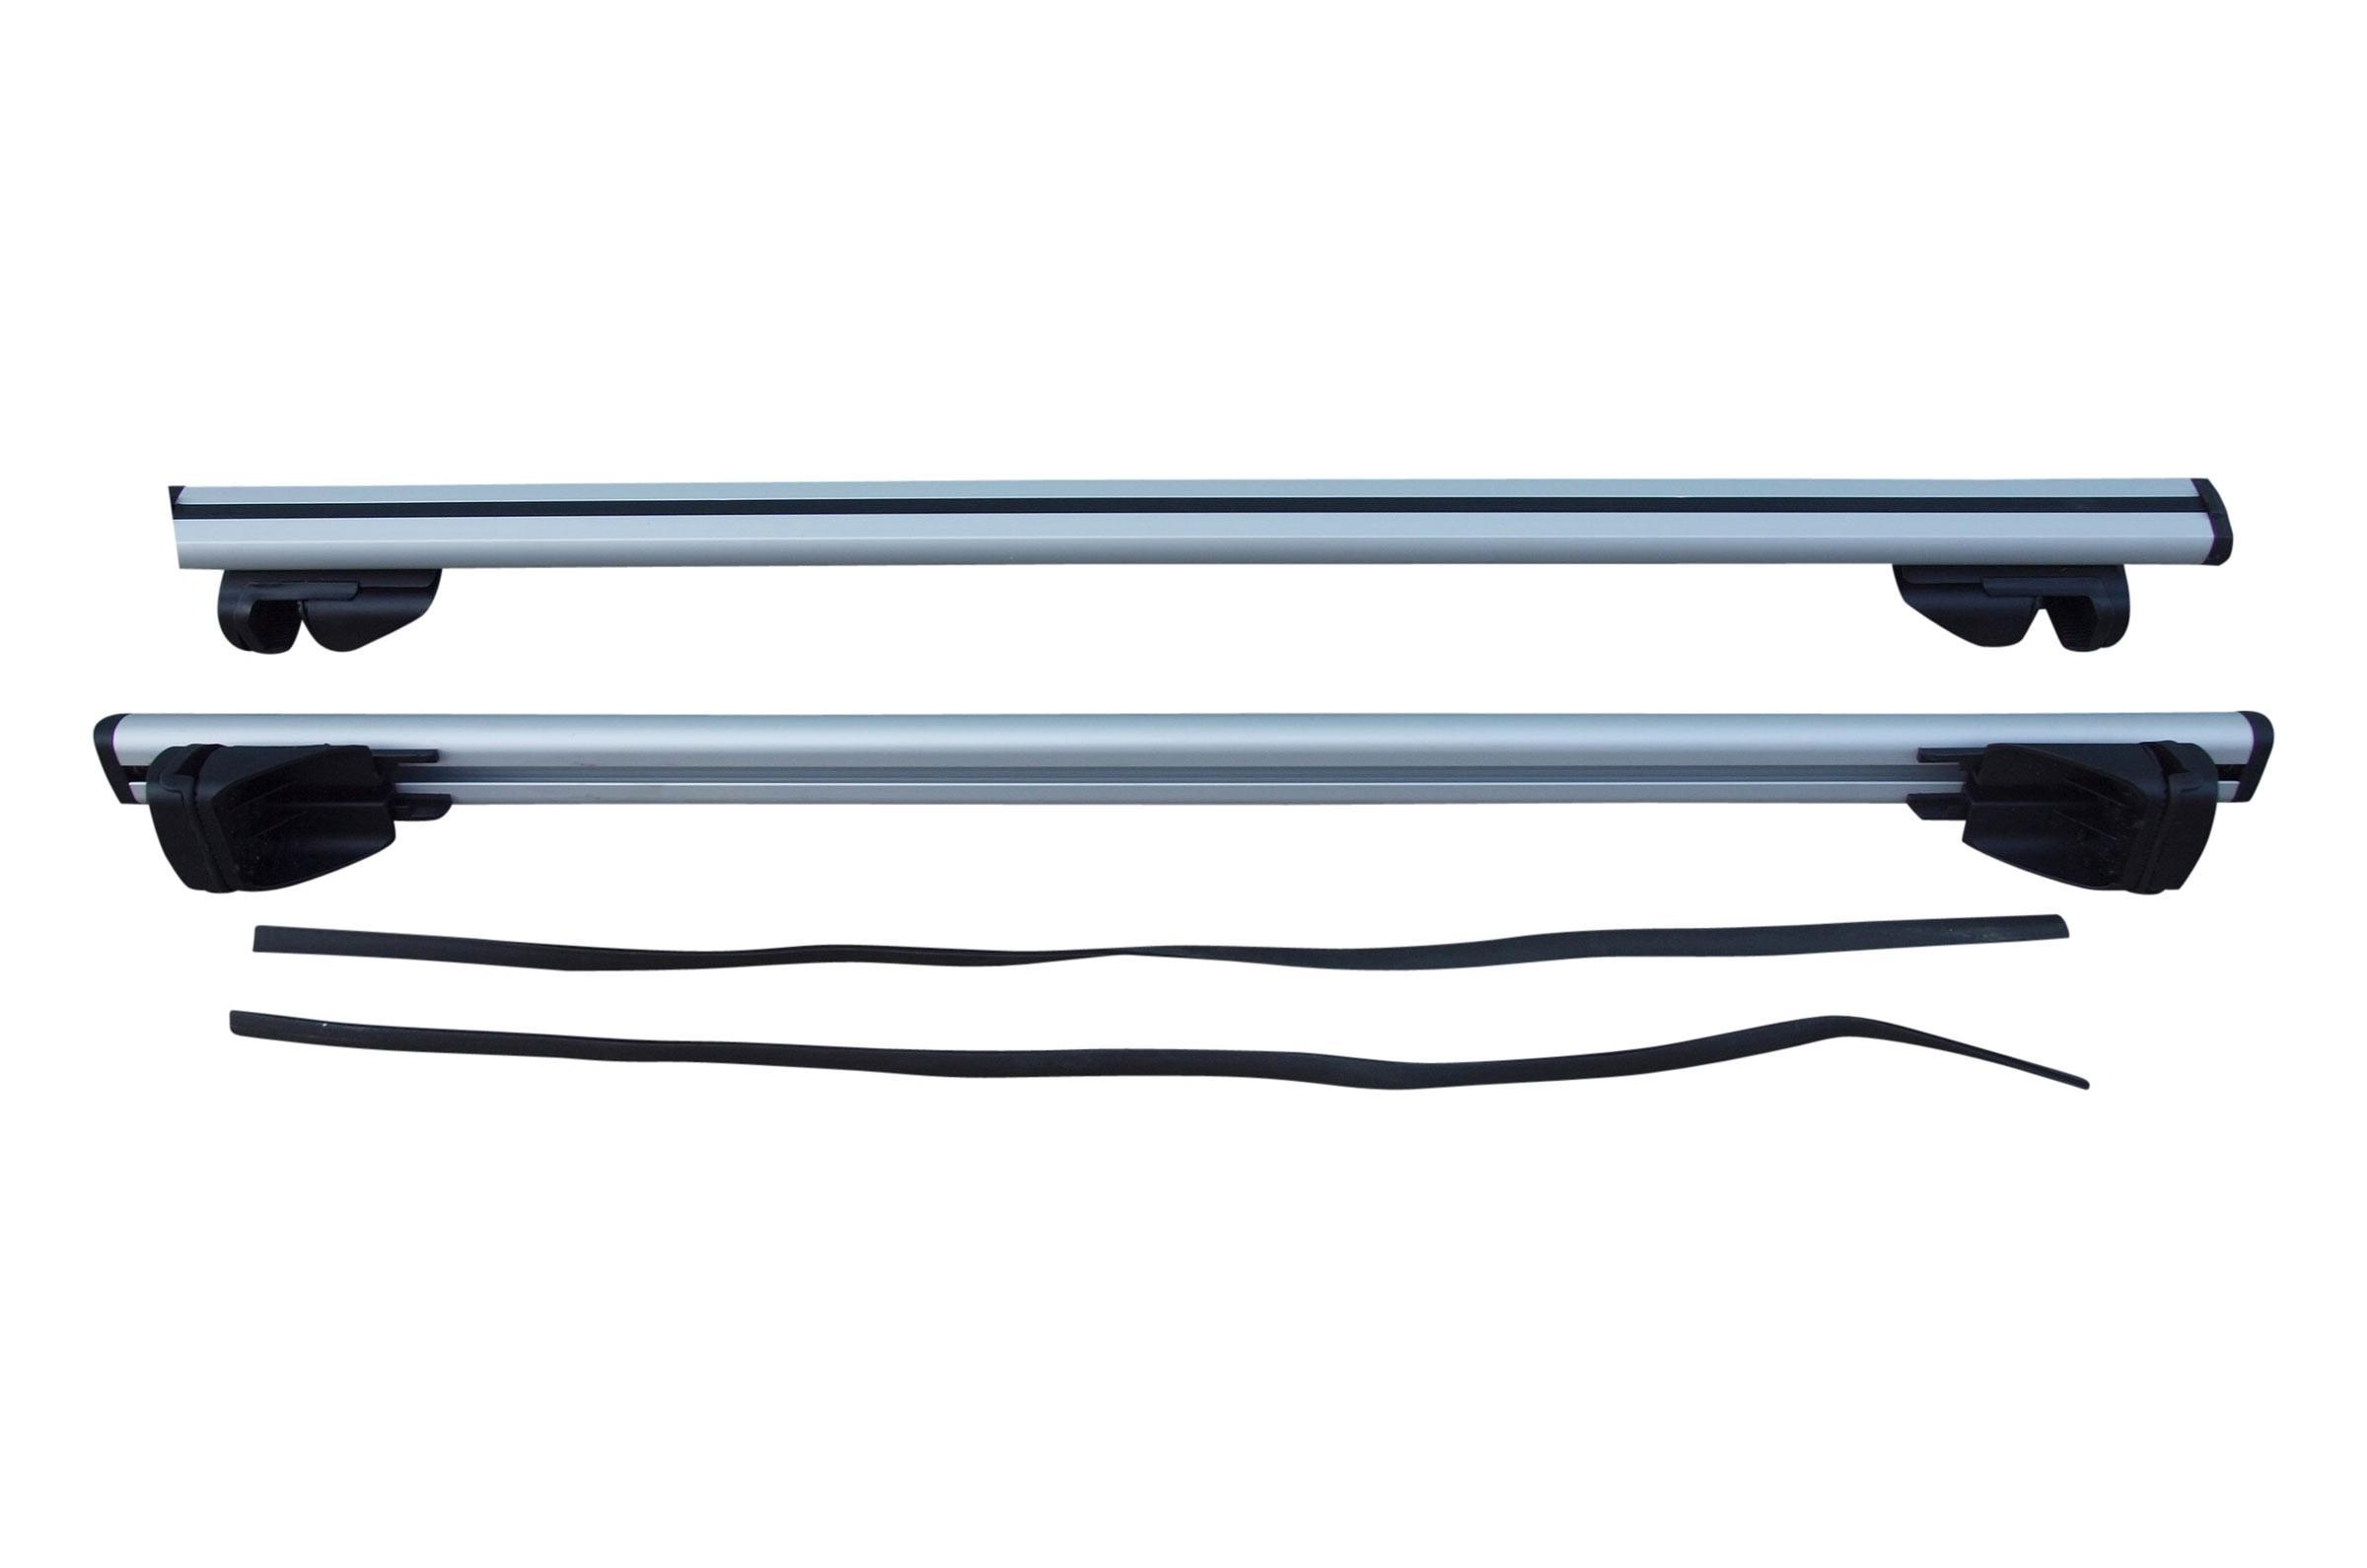 Horizontale Auto-Dachträger für Kajak